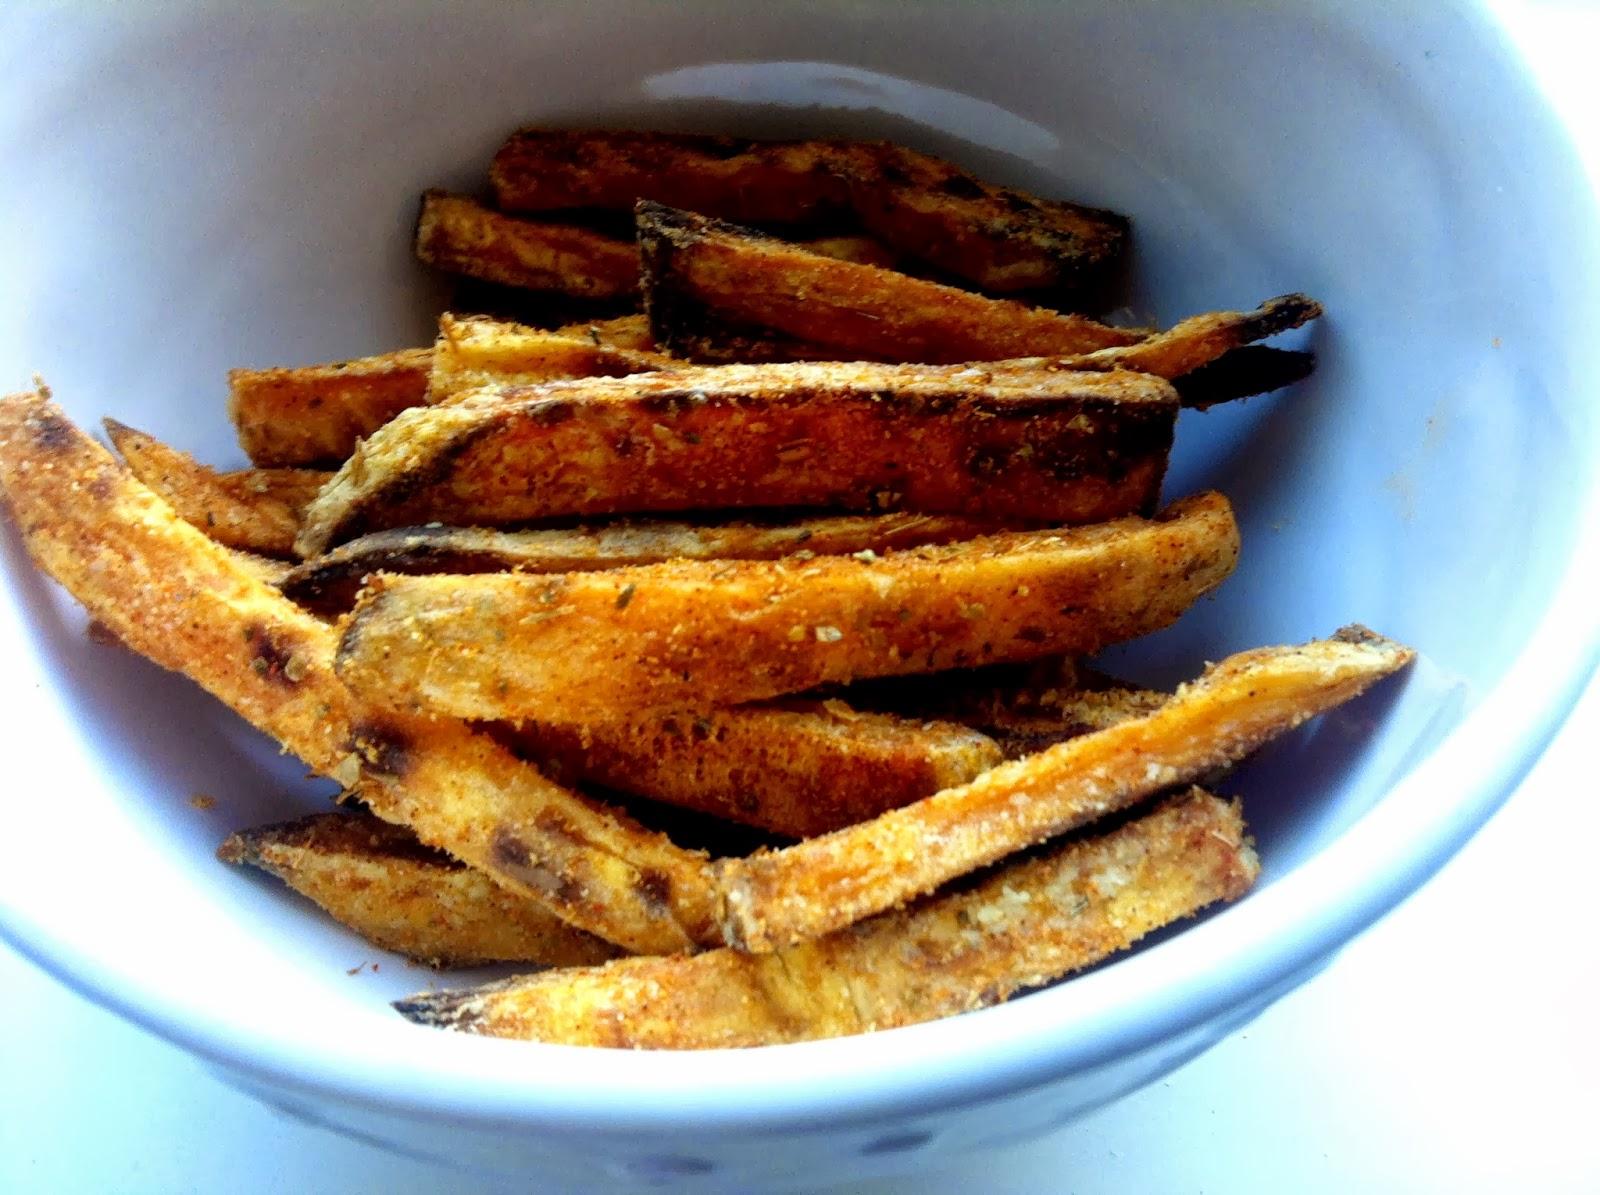 Baked Sweet Potato Fries with Five Guys' Cajun Seasoning